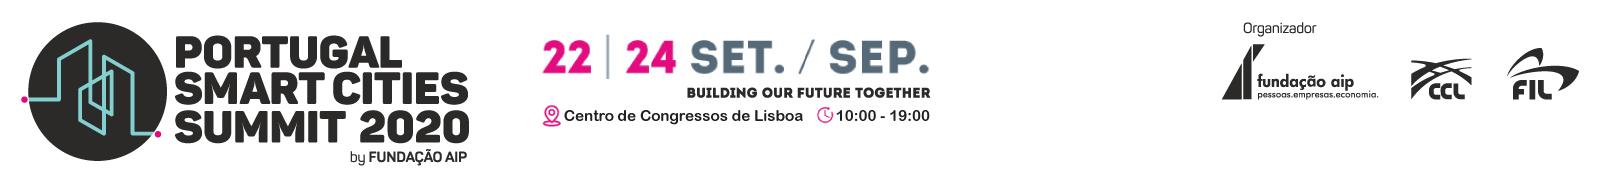 Portugal Smart Cities Summit Logo